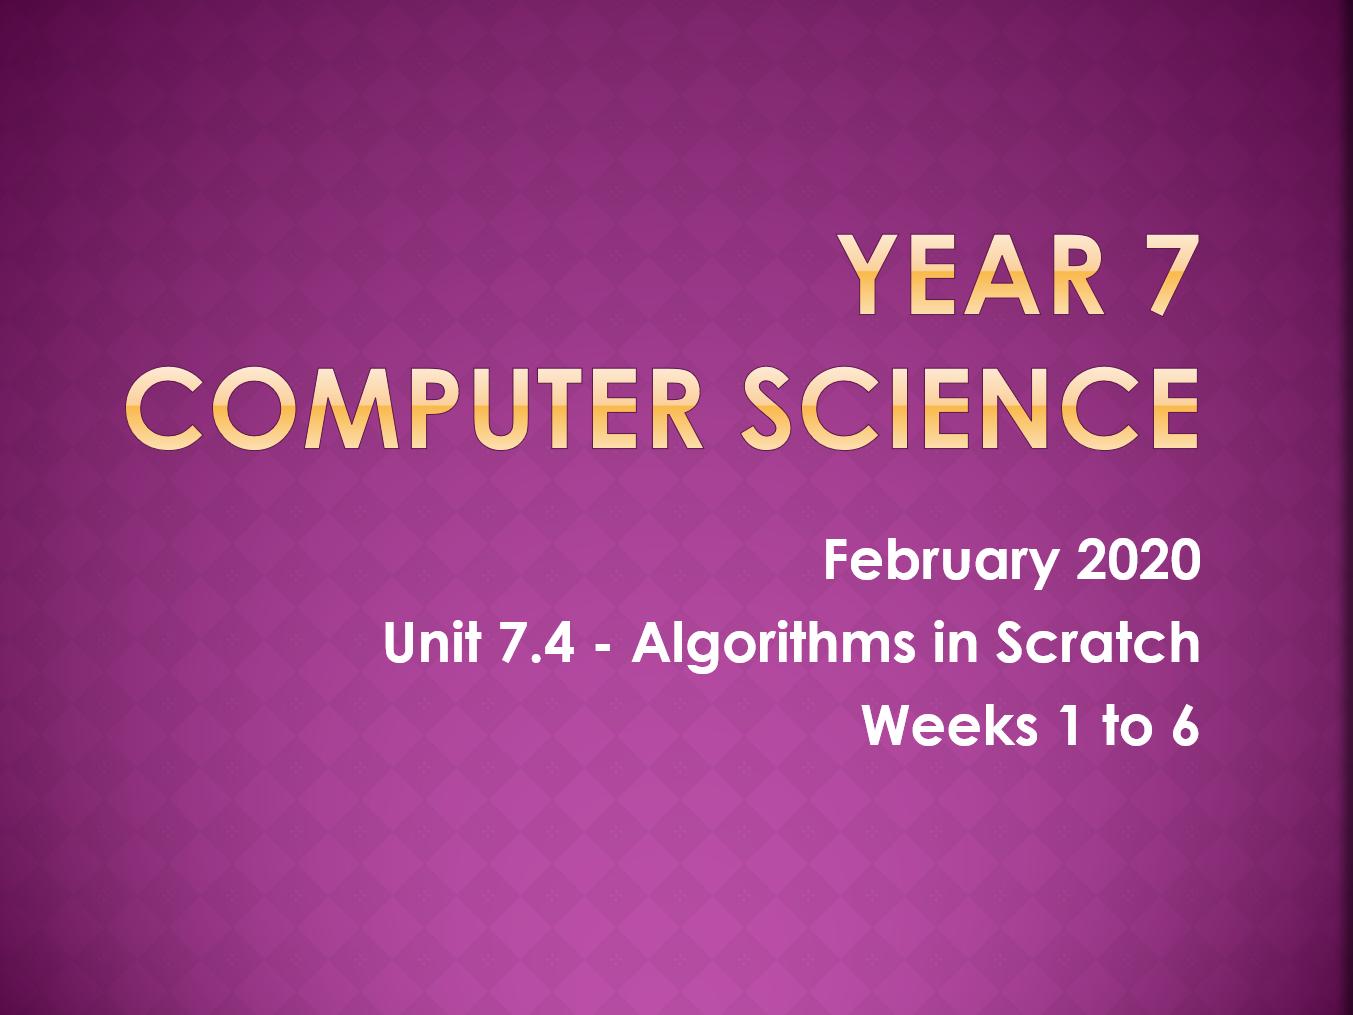 Complete Computer Science KS3 SOW: Algorithms in Scratch